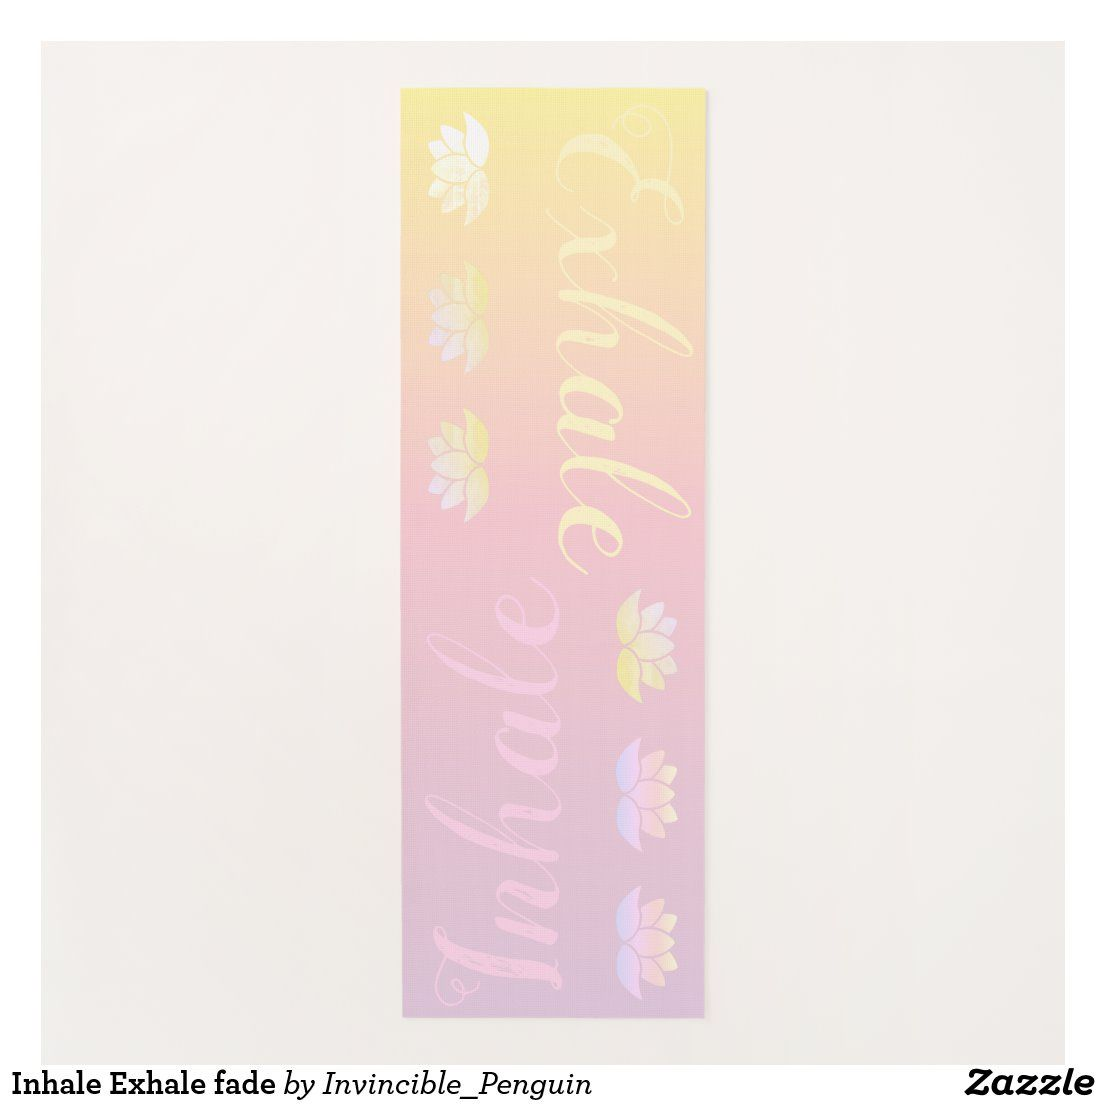 Inhale Exhale fade Yoga Mat   Zazzle.com